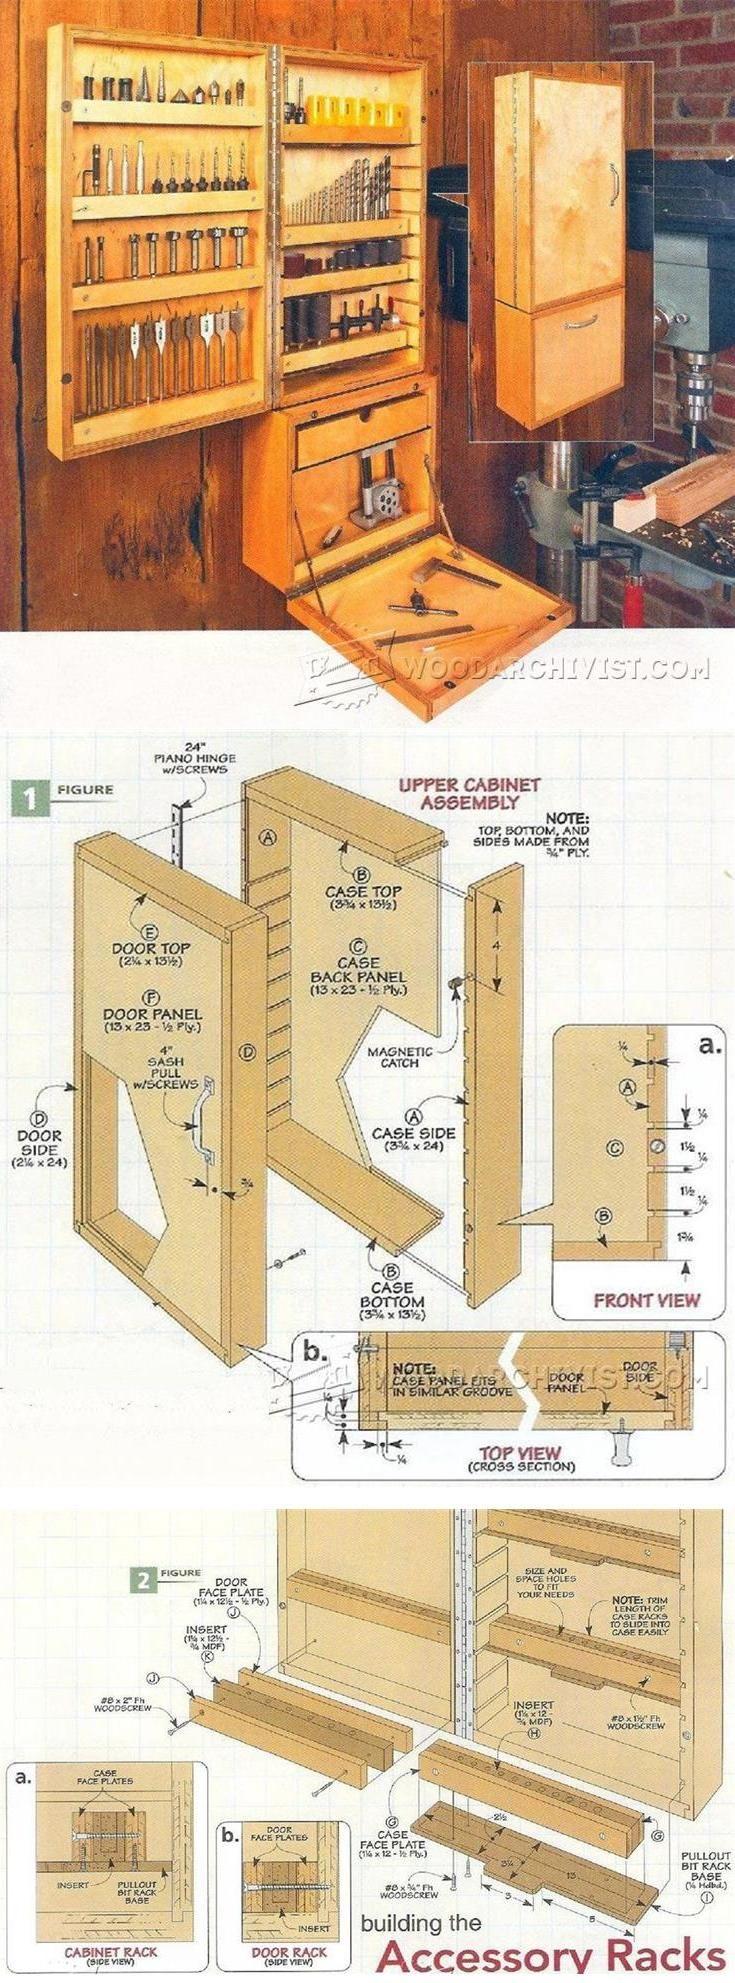 Drill Press Accessory Cabinet Plans - Drill Press Tips, Jigs and Fixtures | WoodArchivist.com